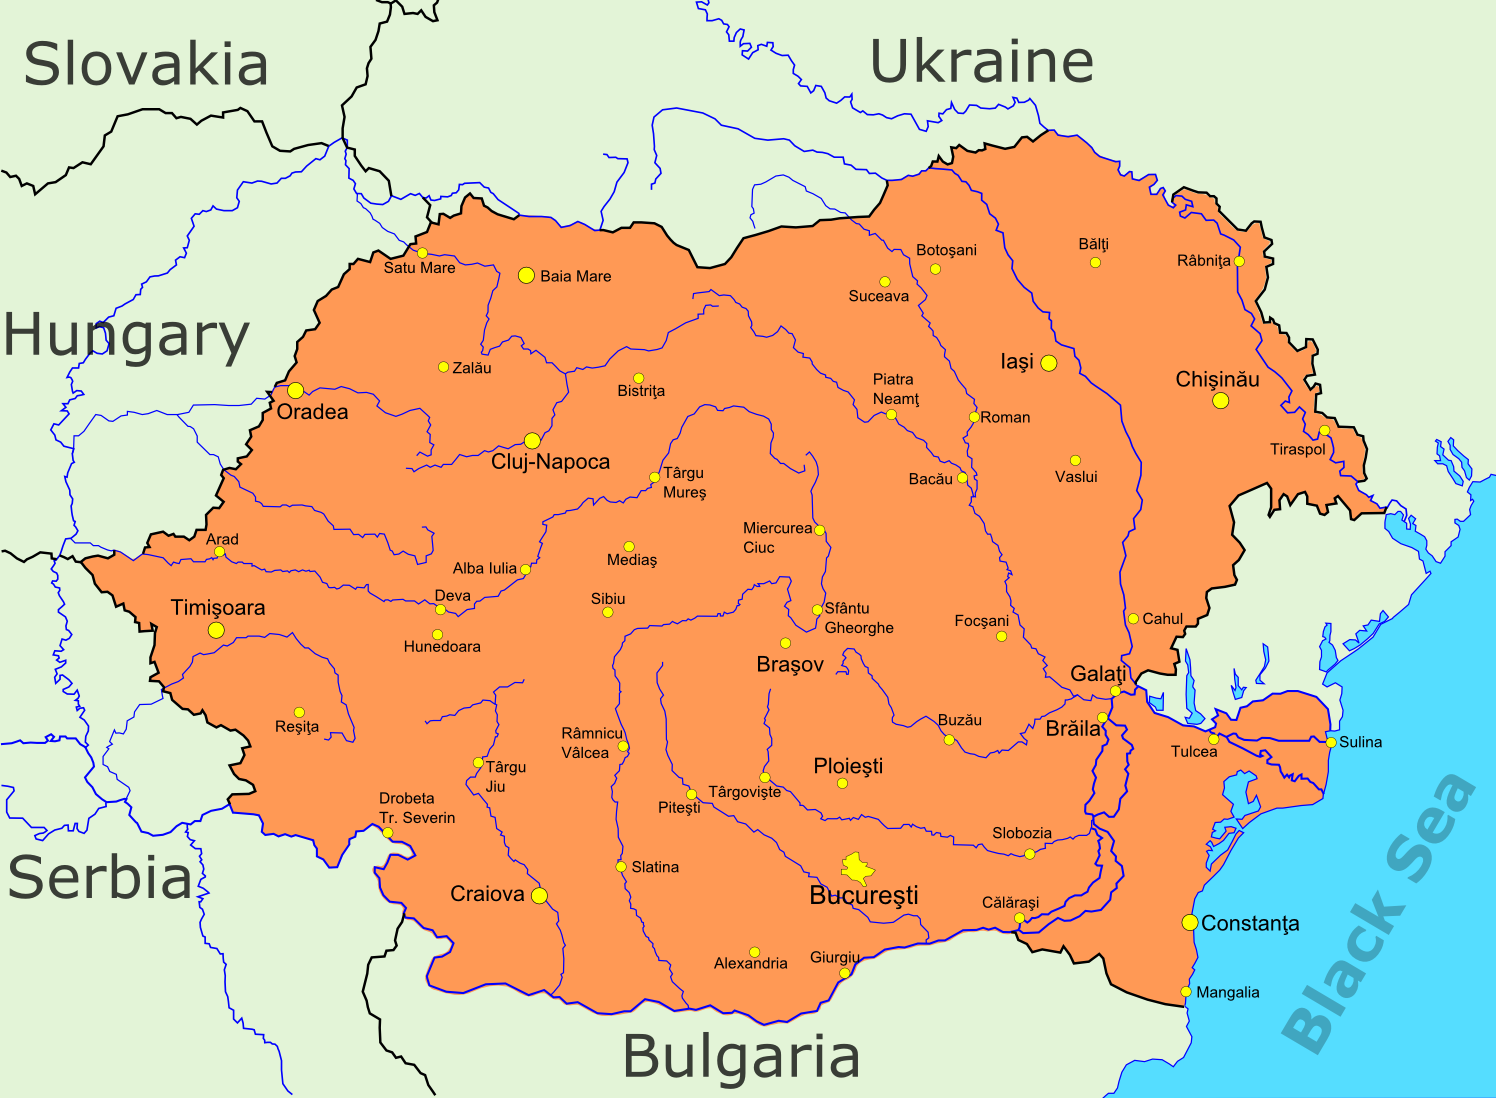 FilePotential Union Of Romania And Moldova Including Transnistria - Transnistria map